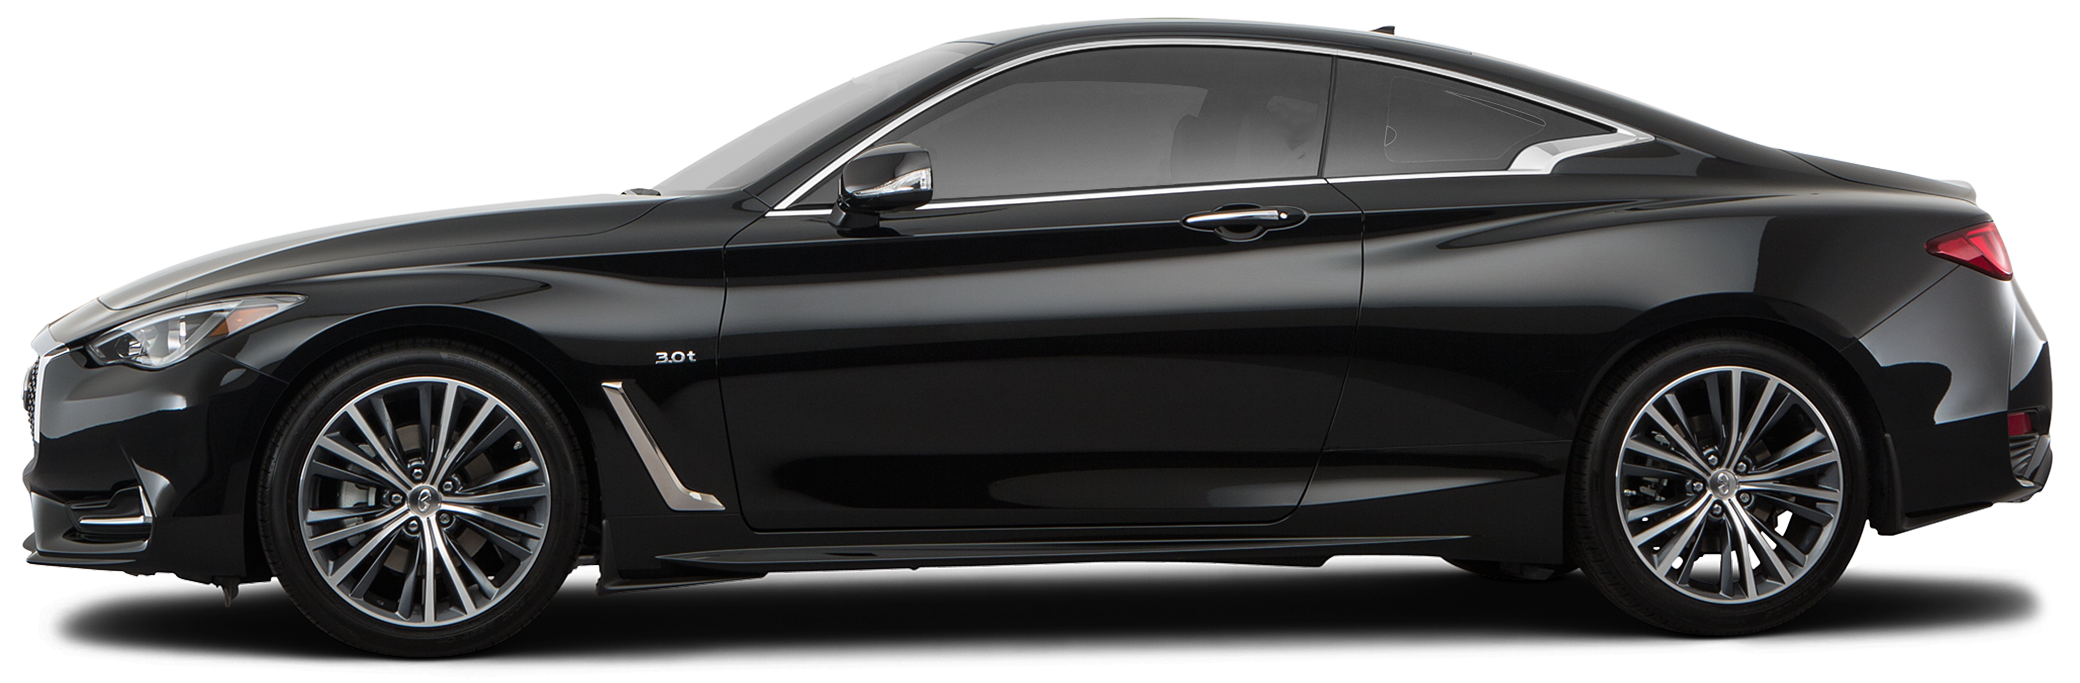 2021 INFINITI Q60 Coupe 3.0t PURE